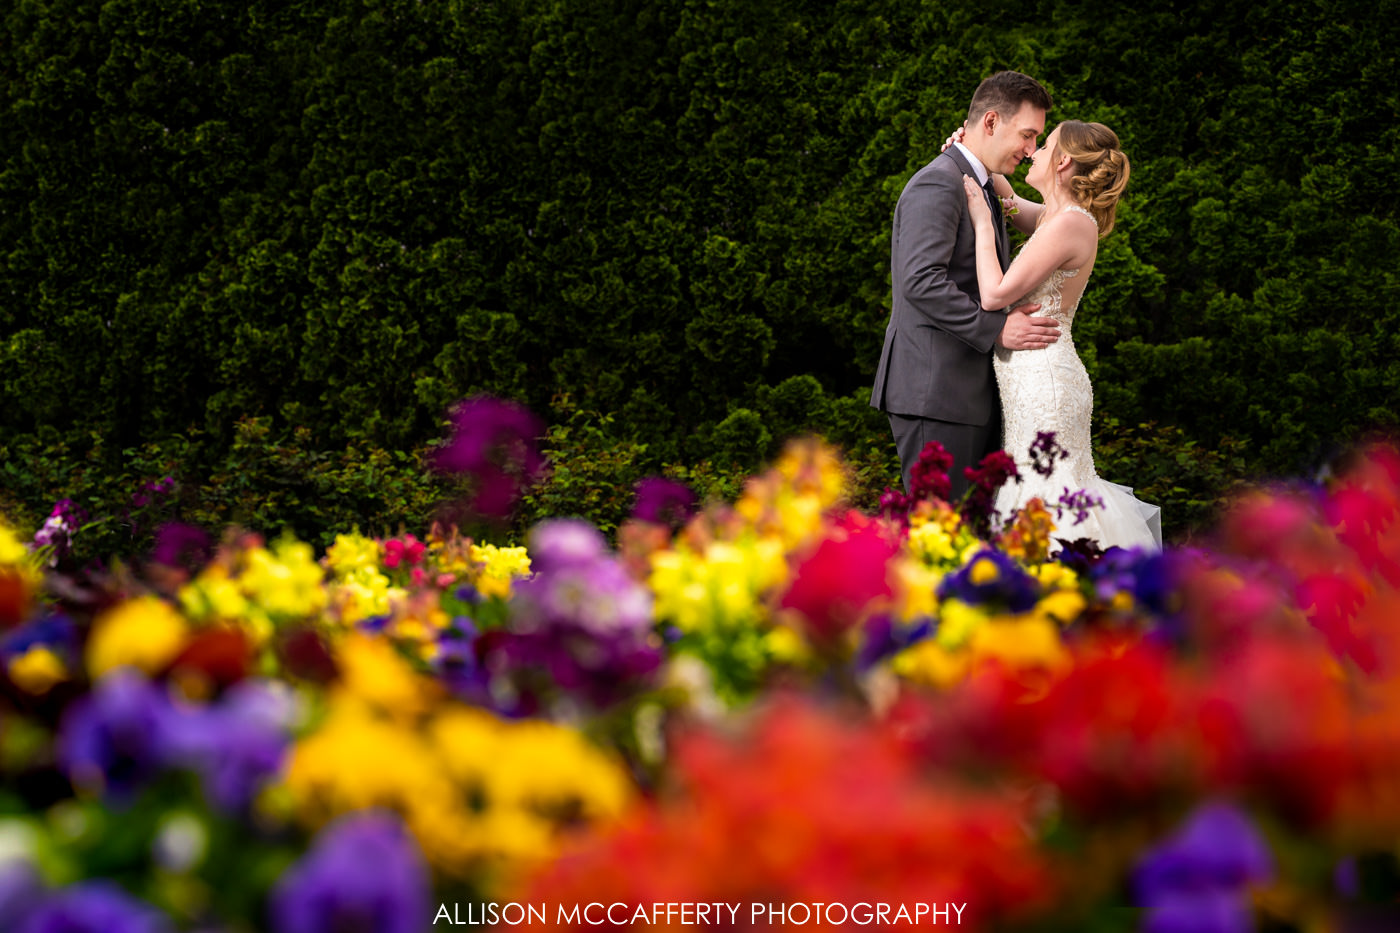 Christine & Chris | A Wedding at The English Manor